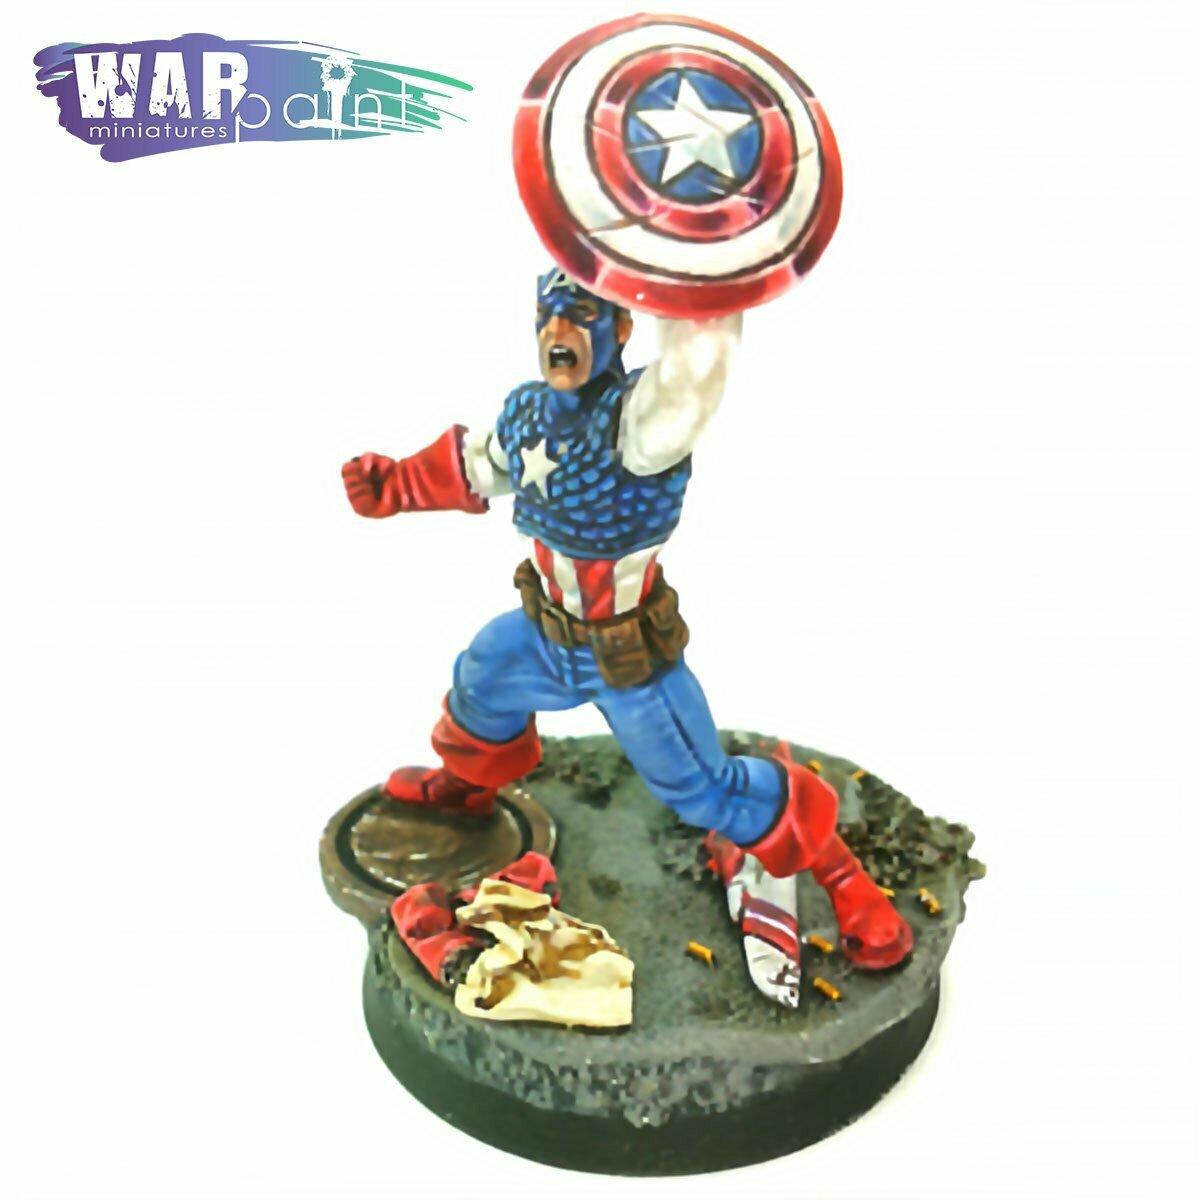 Captain-America-Knight-Models